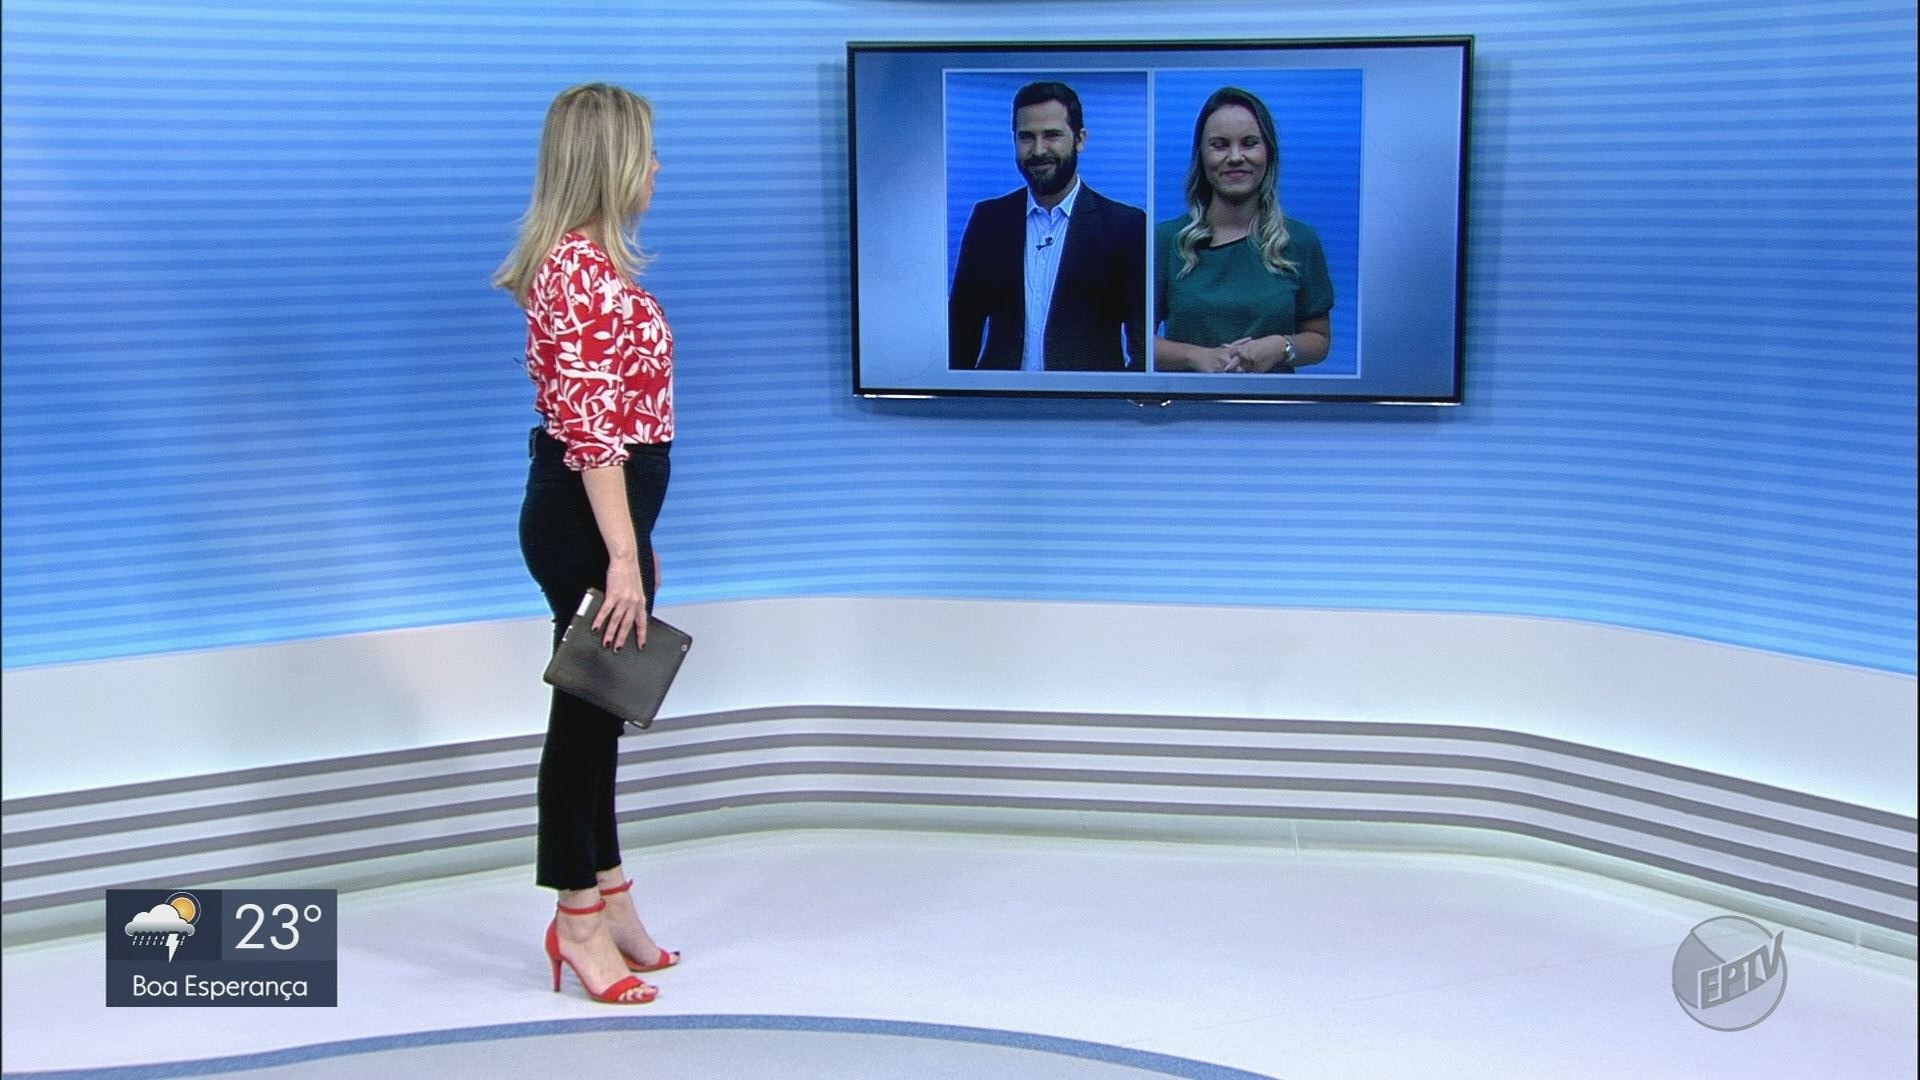 VÍDEOS: EPTV 1 Sul de Minas de segunda-feira, 24 de fevereiro